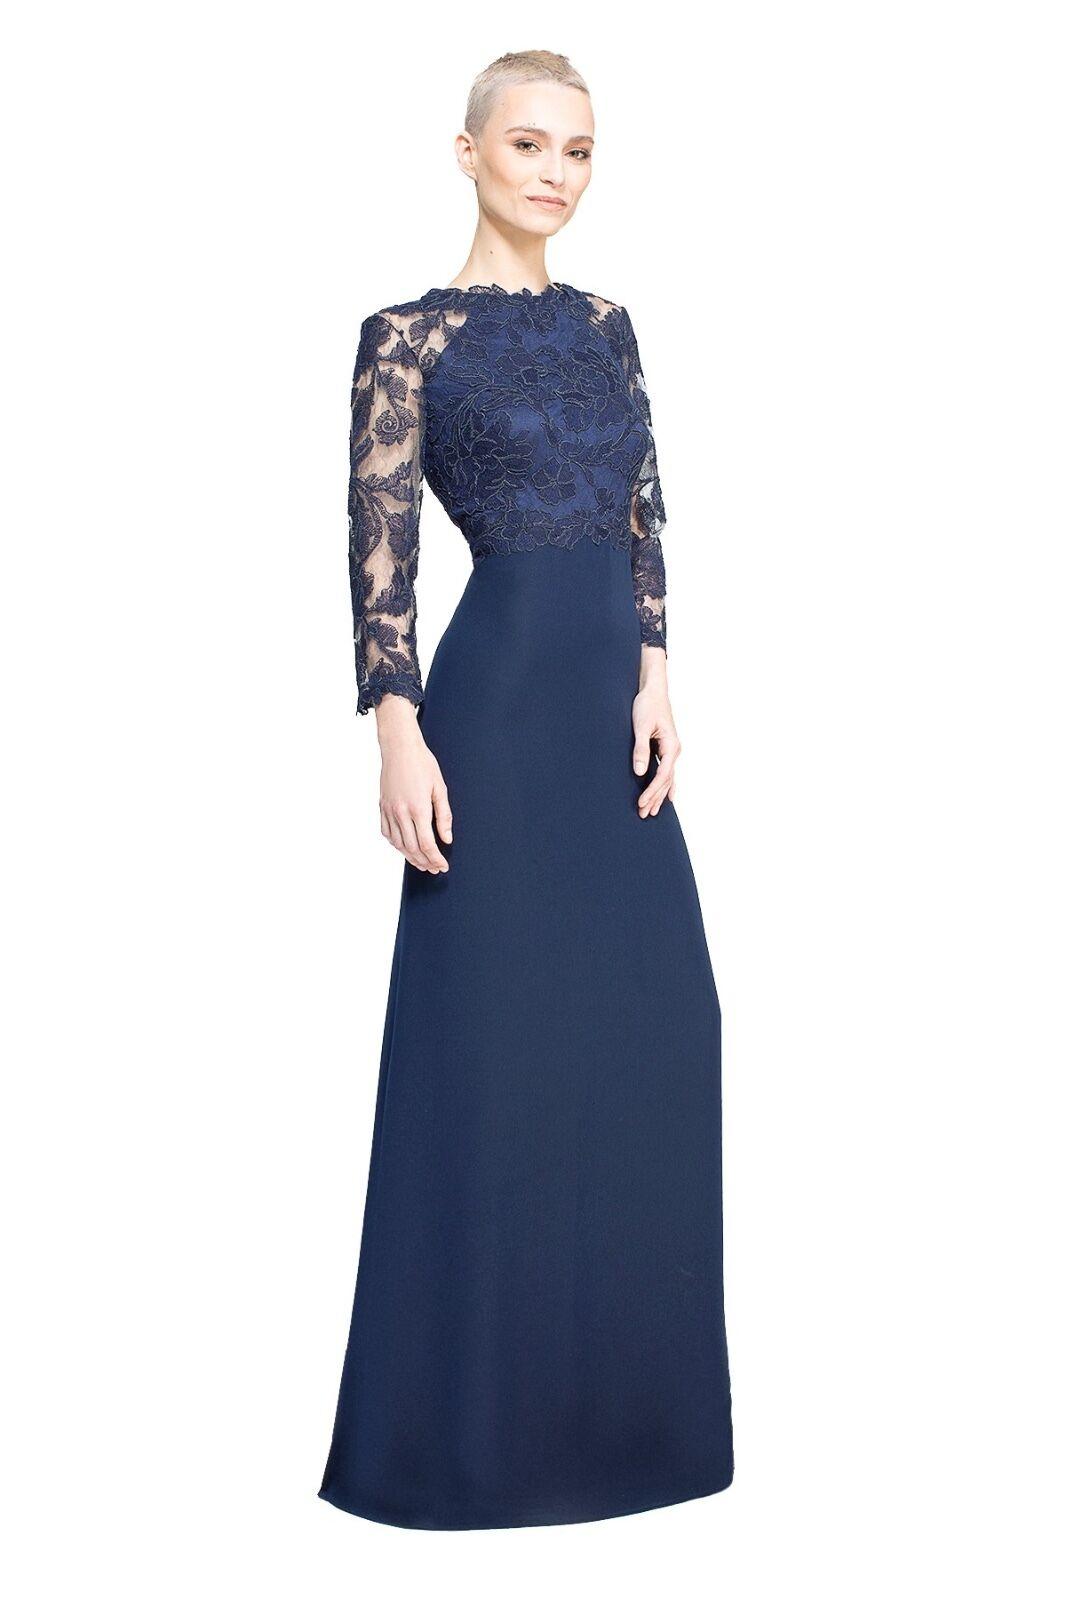 TADASHI SHOJI Peony Embroidered Stretch Crepe Gown Gown Gown NWT  525 Sz 2 Navy blueee 9acb4b